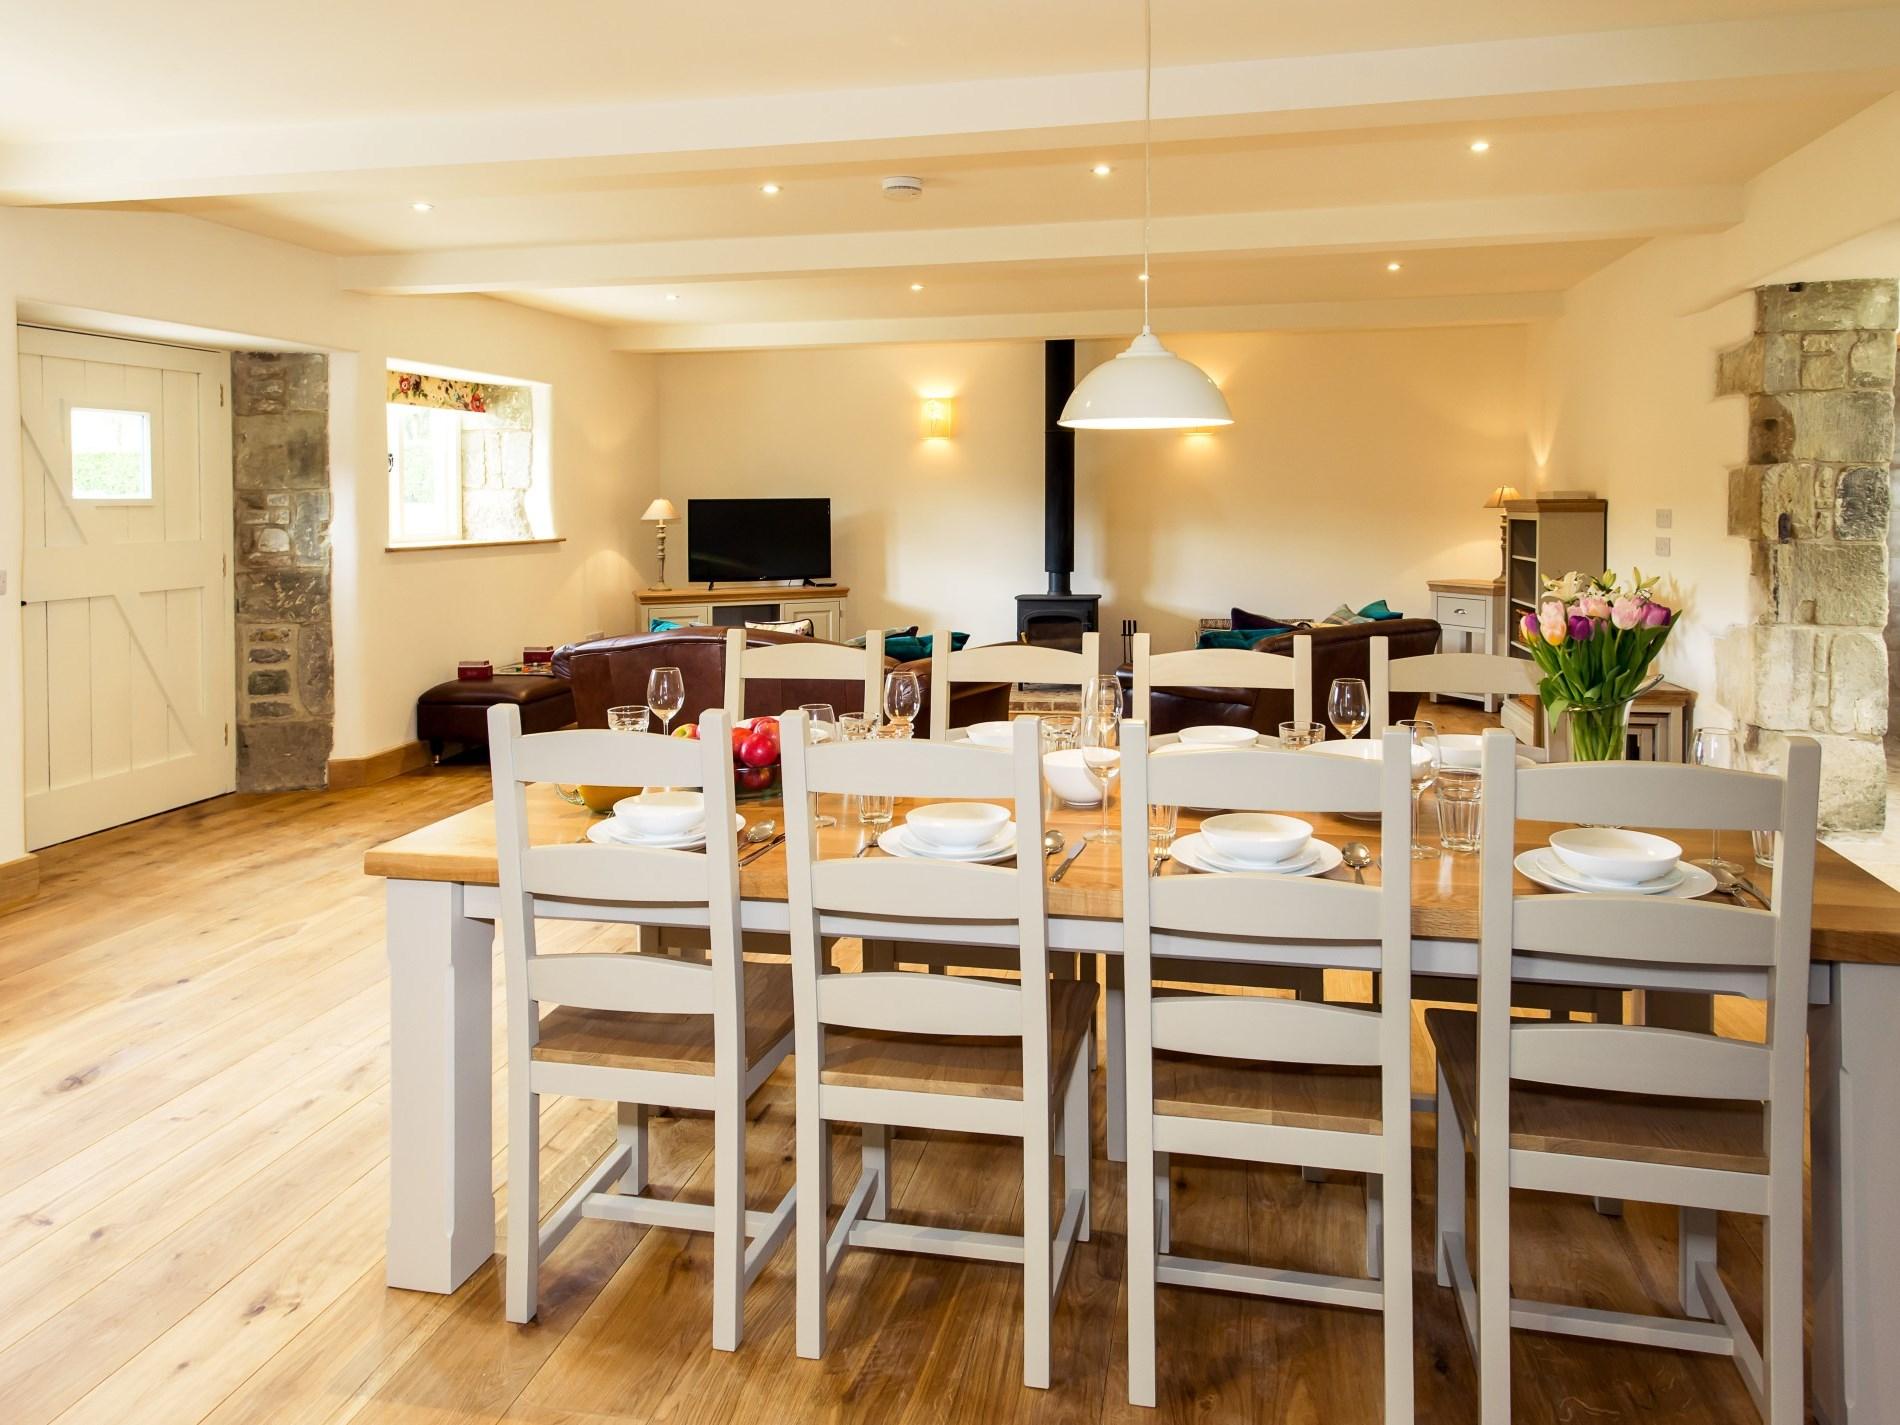 2 Bedroom Cottage in Shaftesbury, Dorset and Somerset